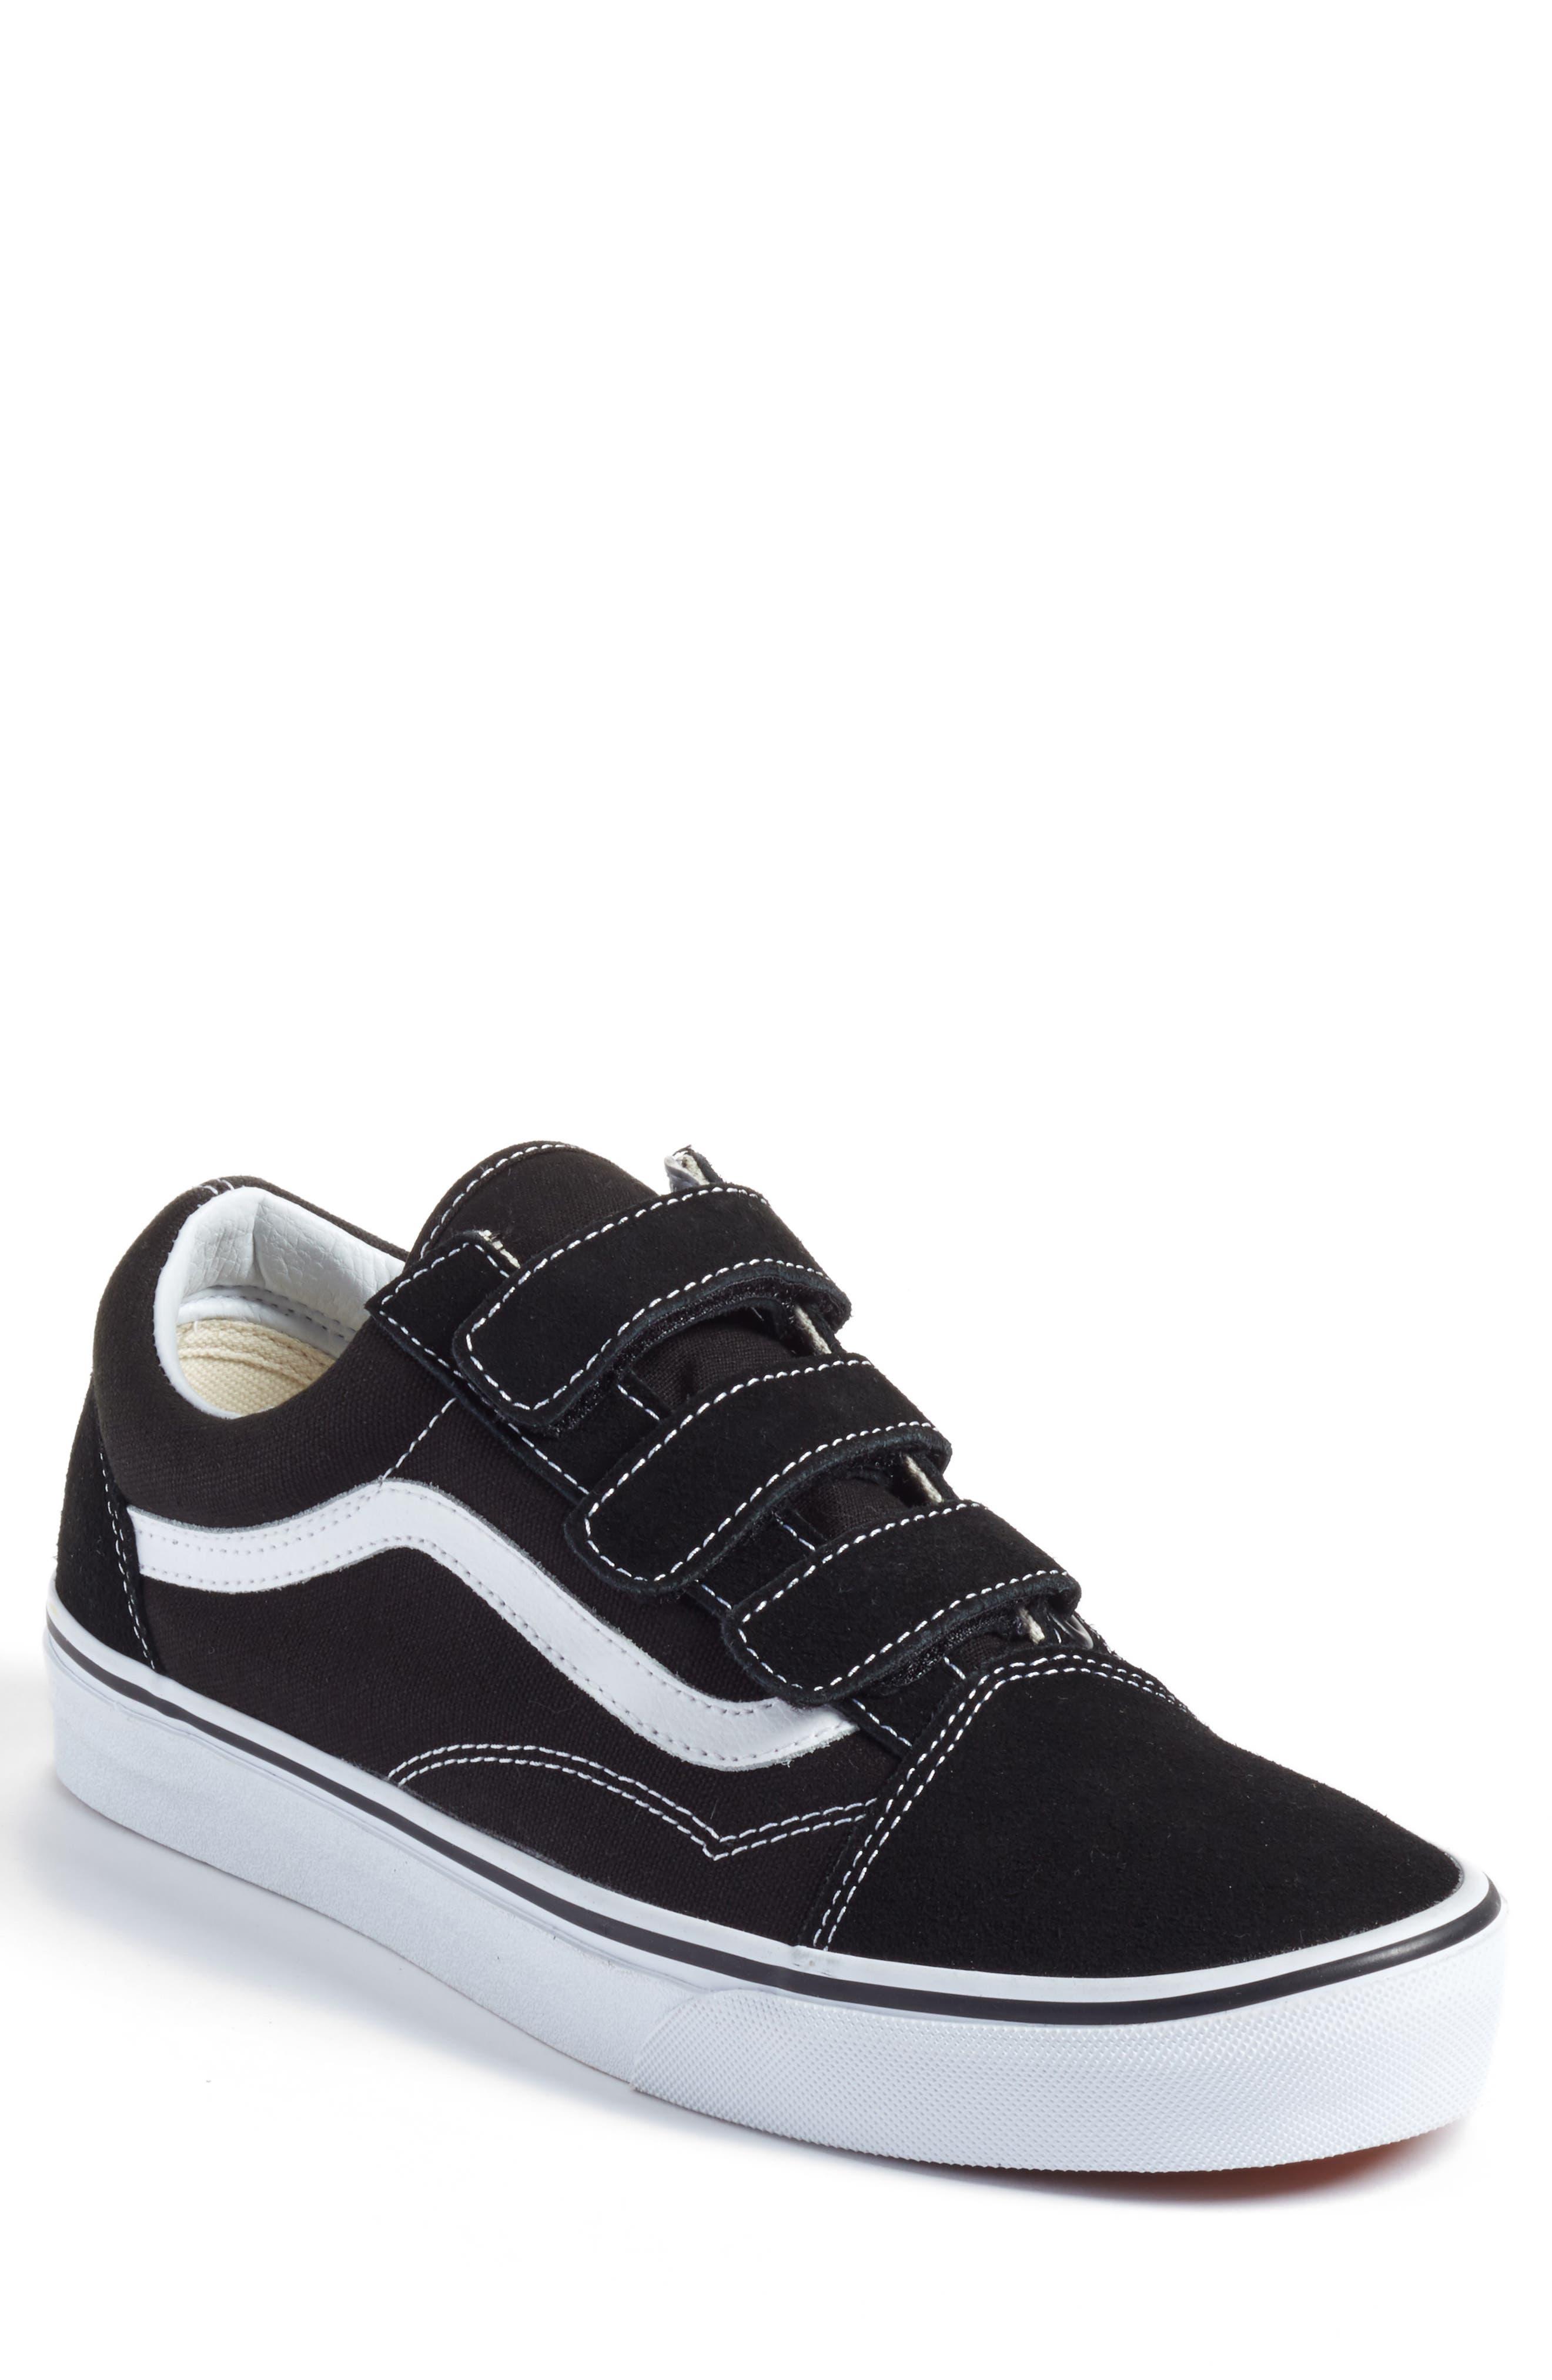 Main Image - Vans Old Skool V-Sneaker (Men)